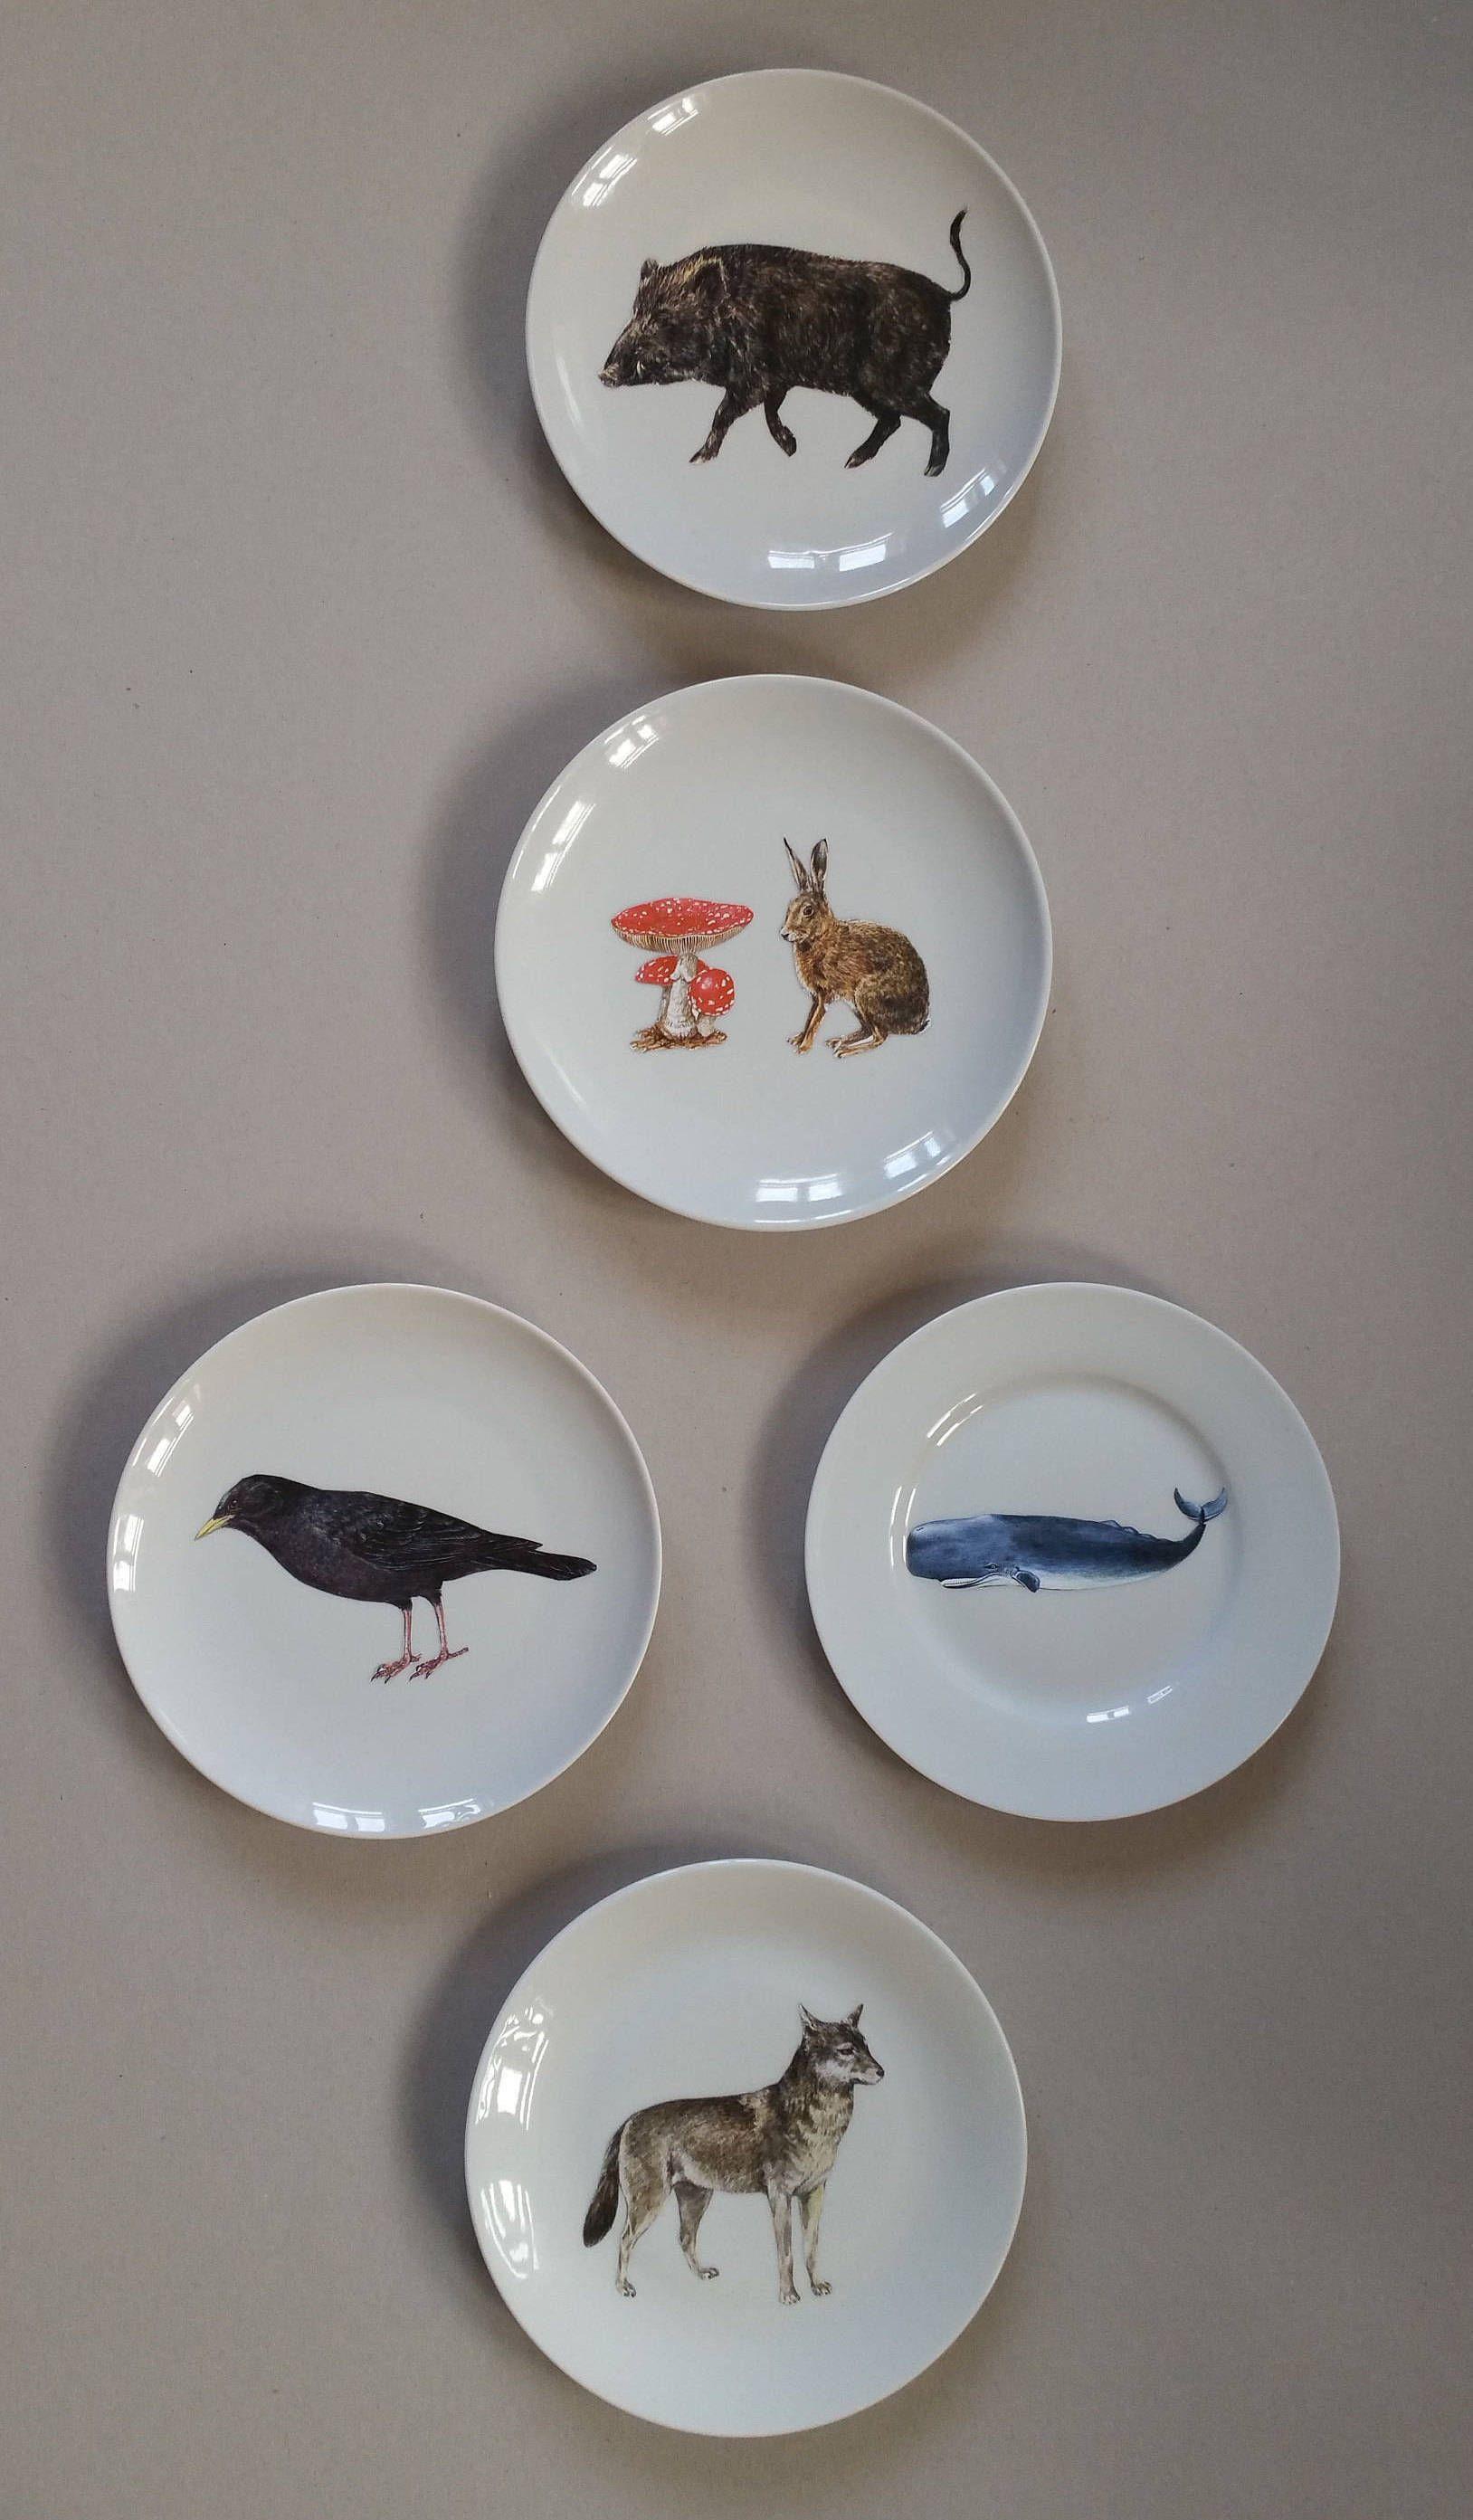 Wandteller Keramik Schwalbe Deko Bild Wandschmuck Küche